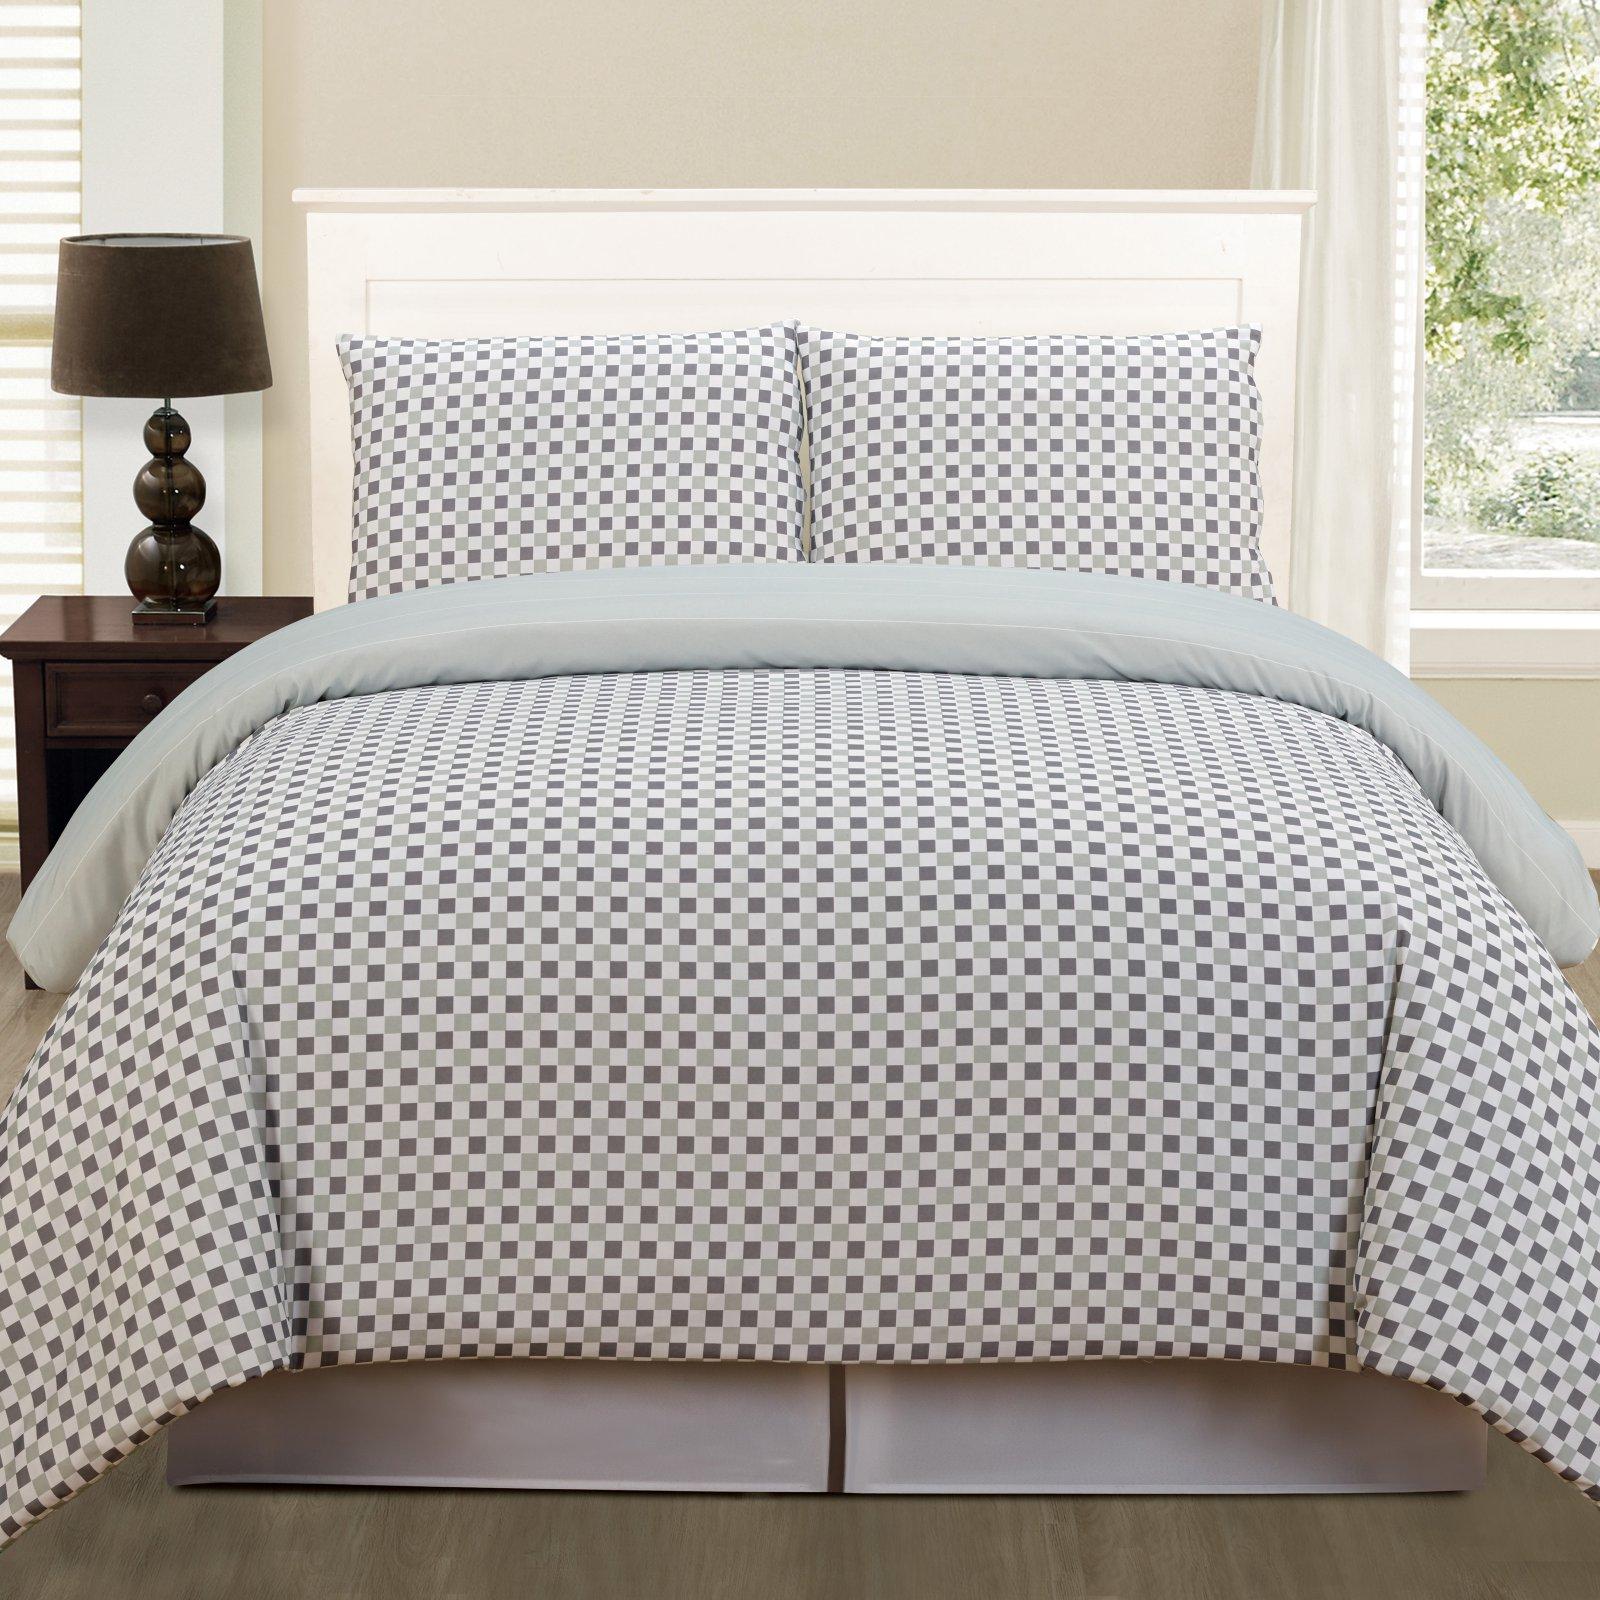 Luna Lala+bash 2 Piece Twin Comforter Set in Grey